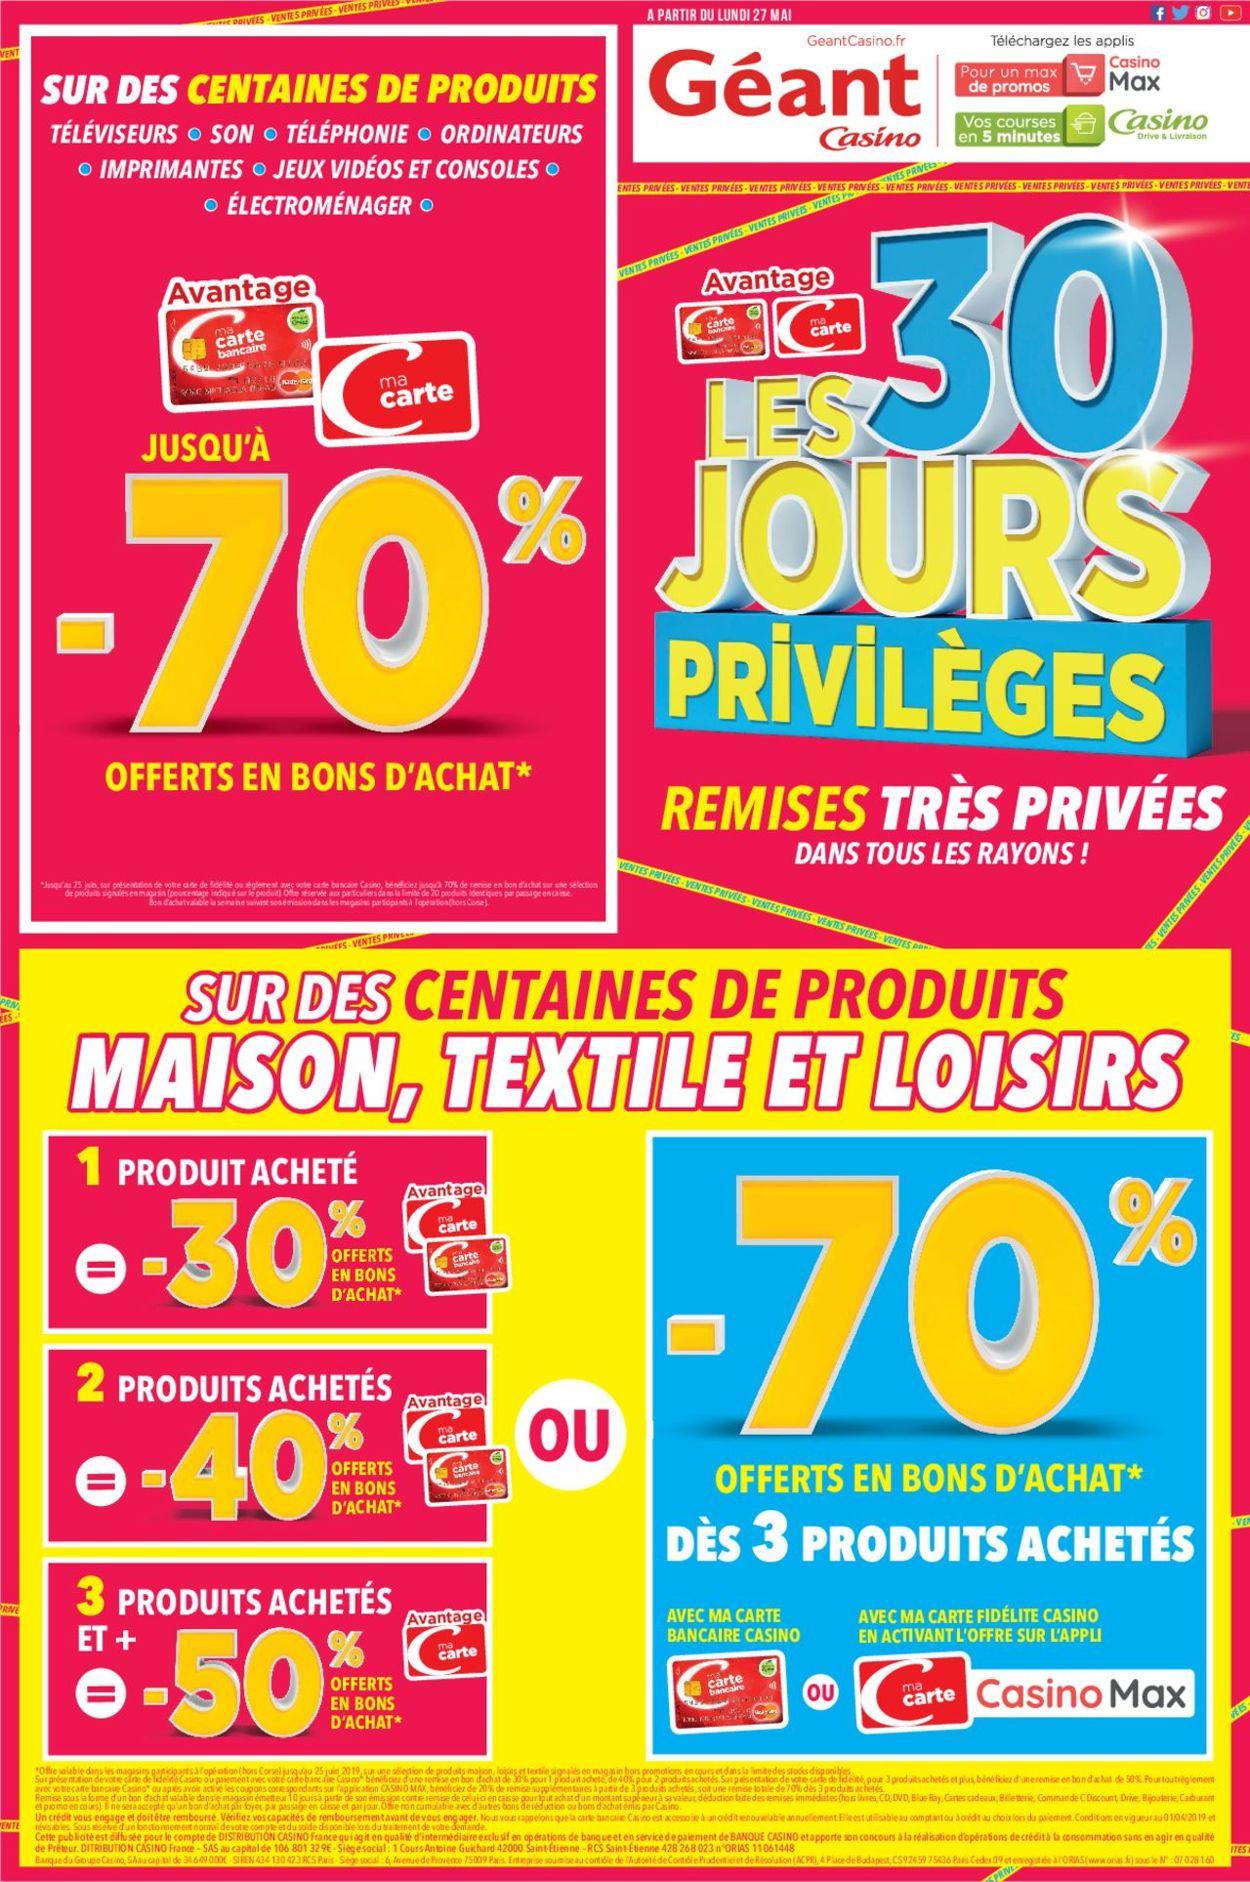 Géant Casino Catalogue - 27.05-25.06.2019